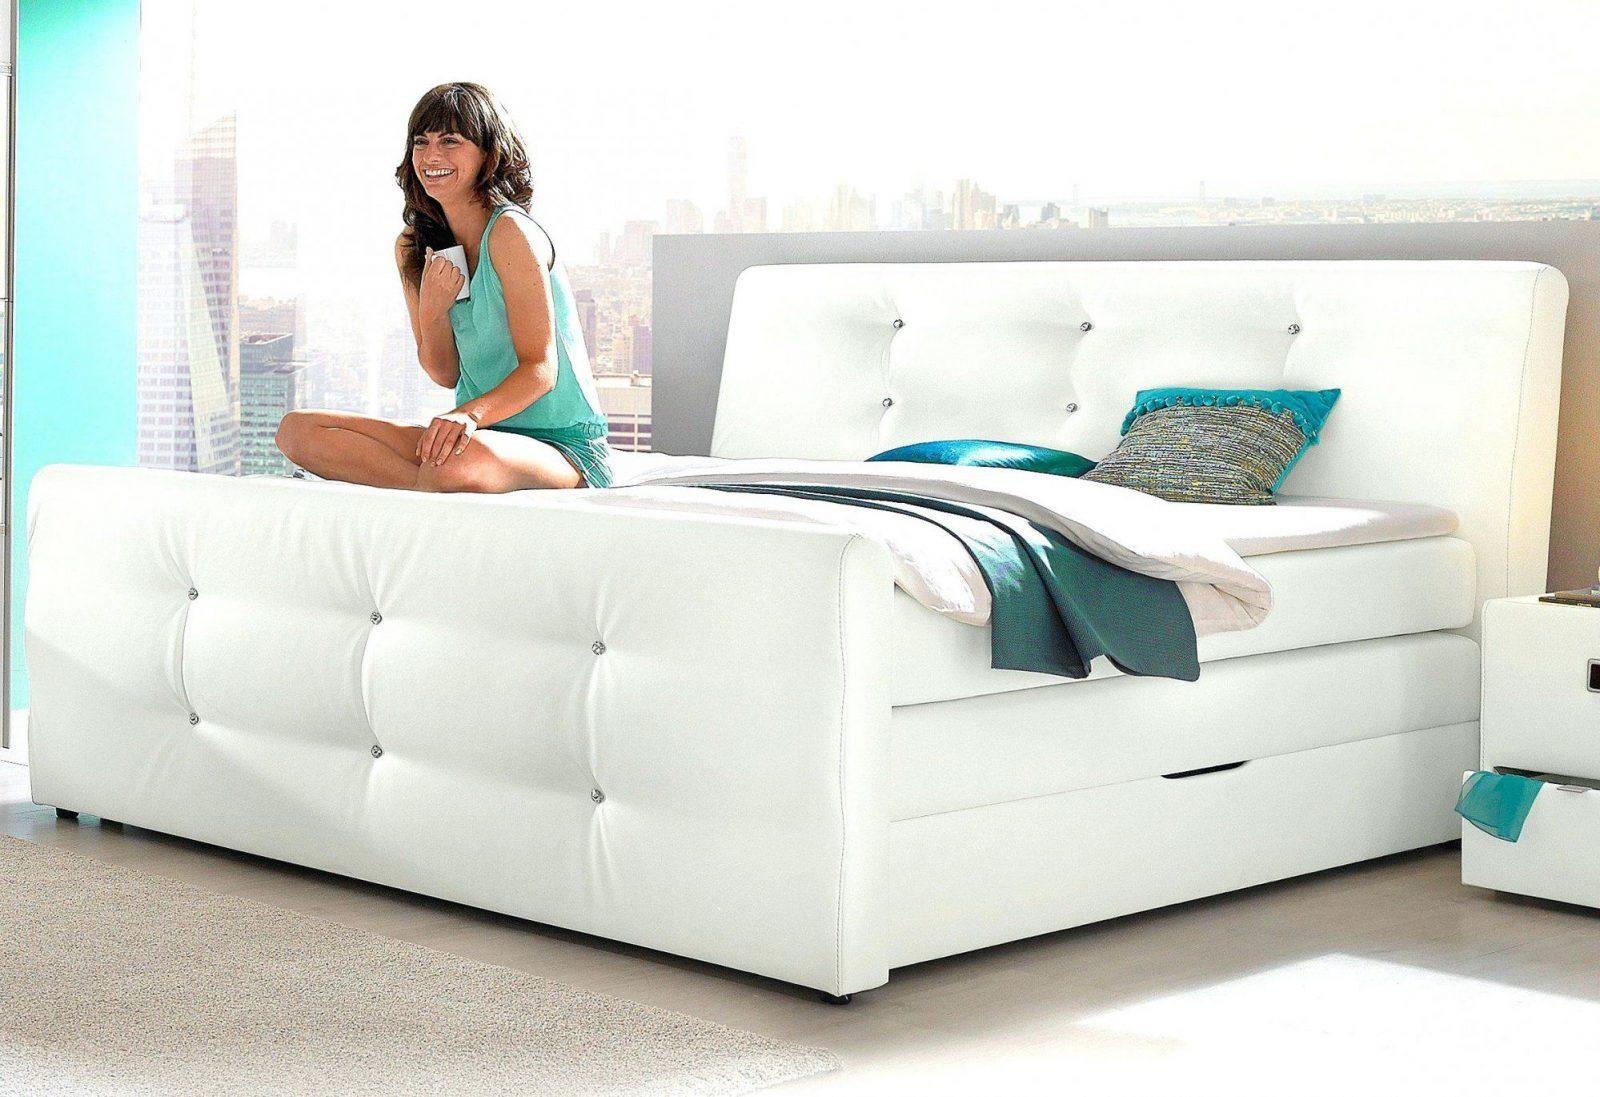 Bett 140×200 Bettkasten Bett 140×200 Mit Bettkasten Ikea von Ikea Bett Mit Kasten Photo